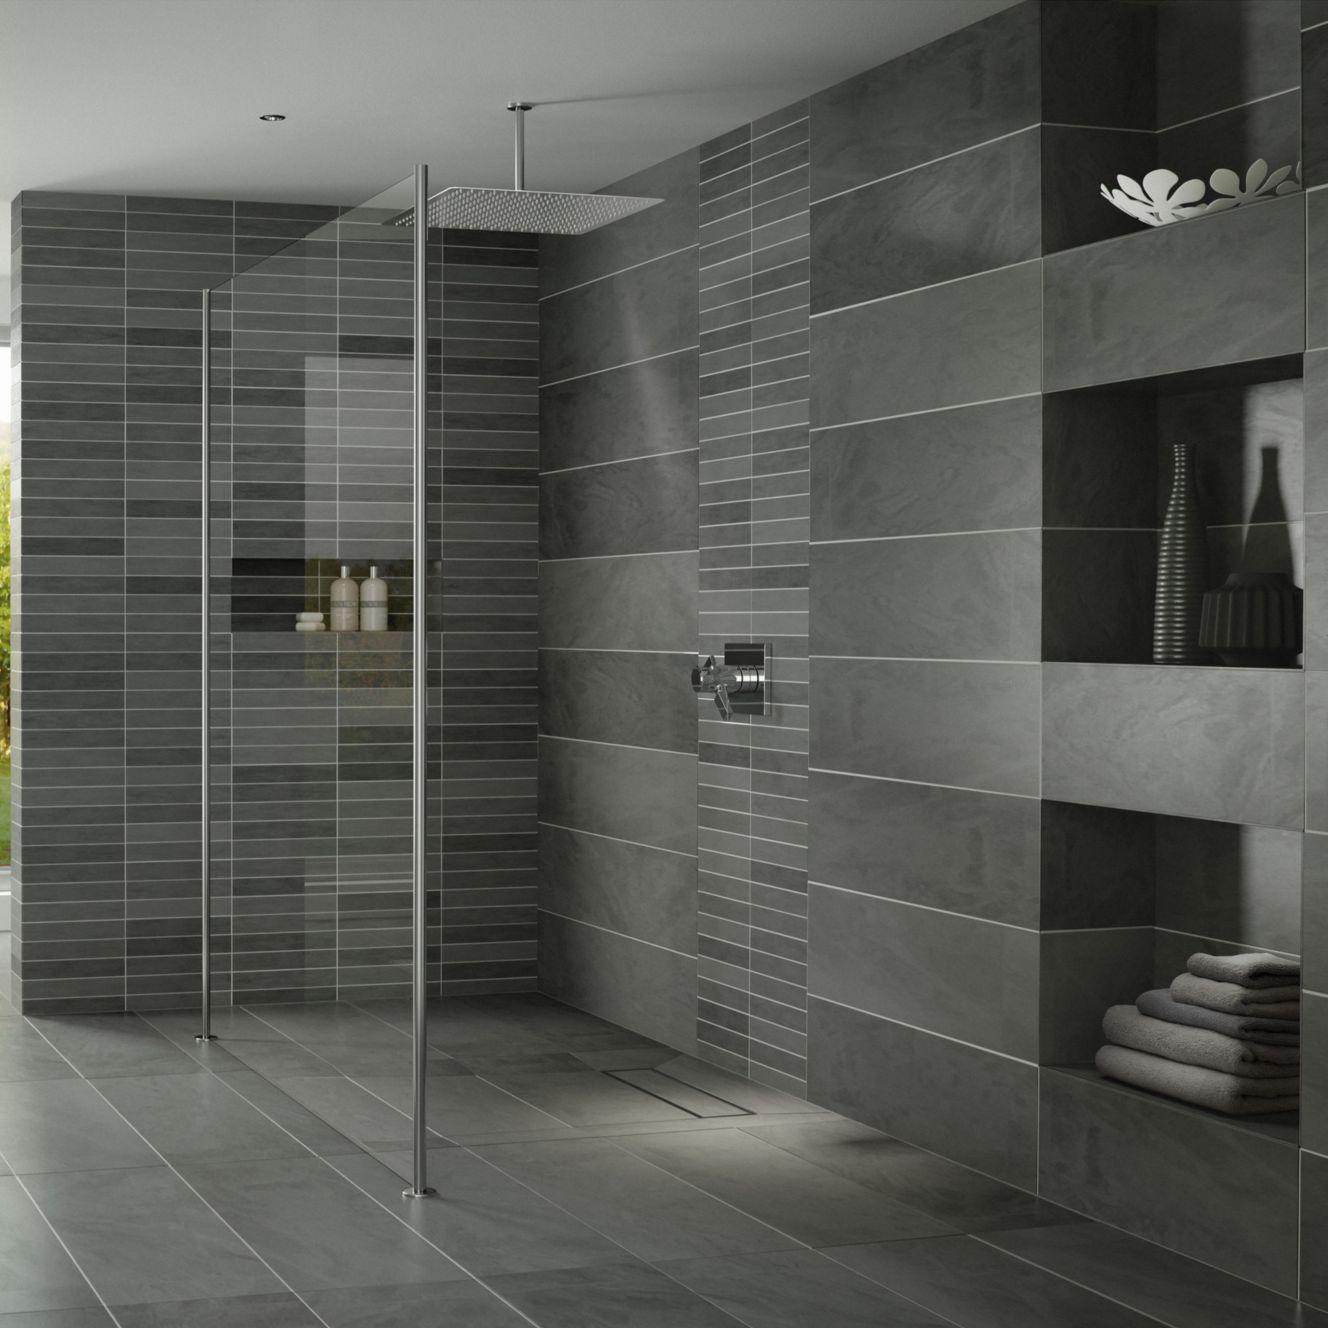 Ceiling mounted shower head square rain tetra 450 ish1107 ceiling mounted shower head square rain tetra 450 ish1107 dailygadgetfo Choice Image